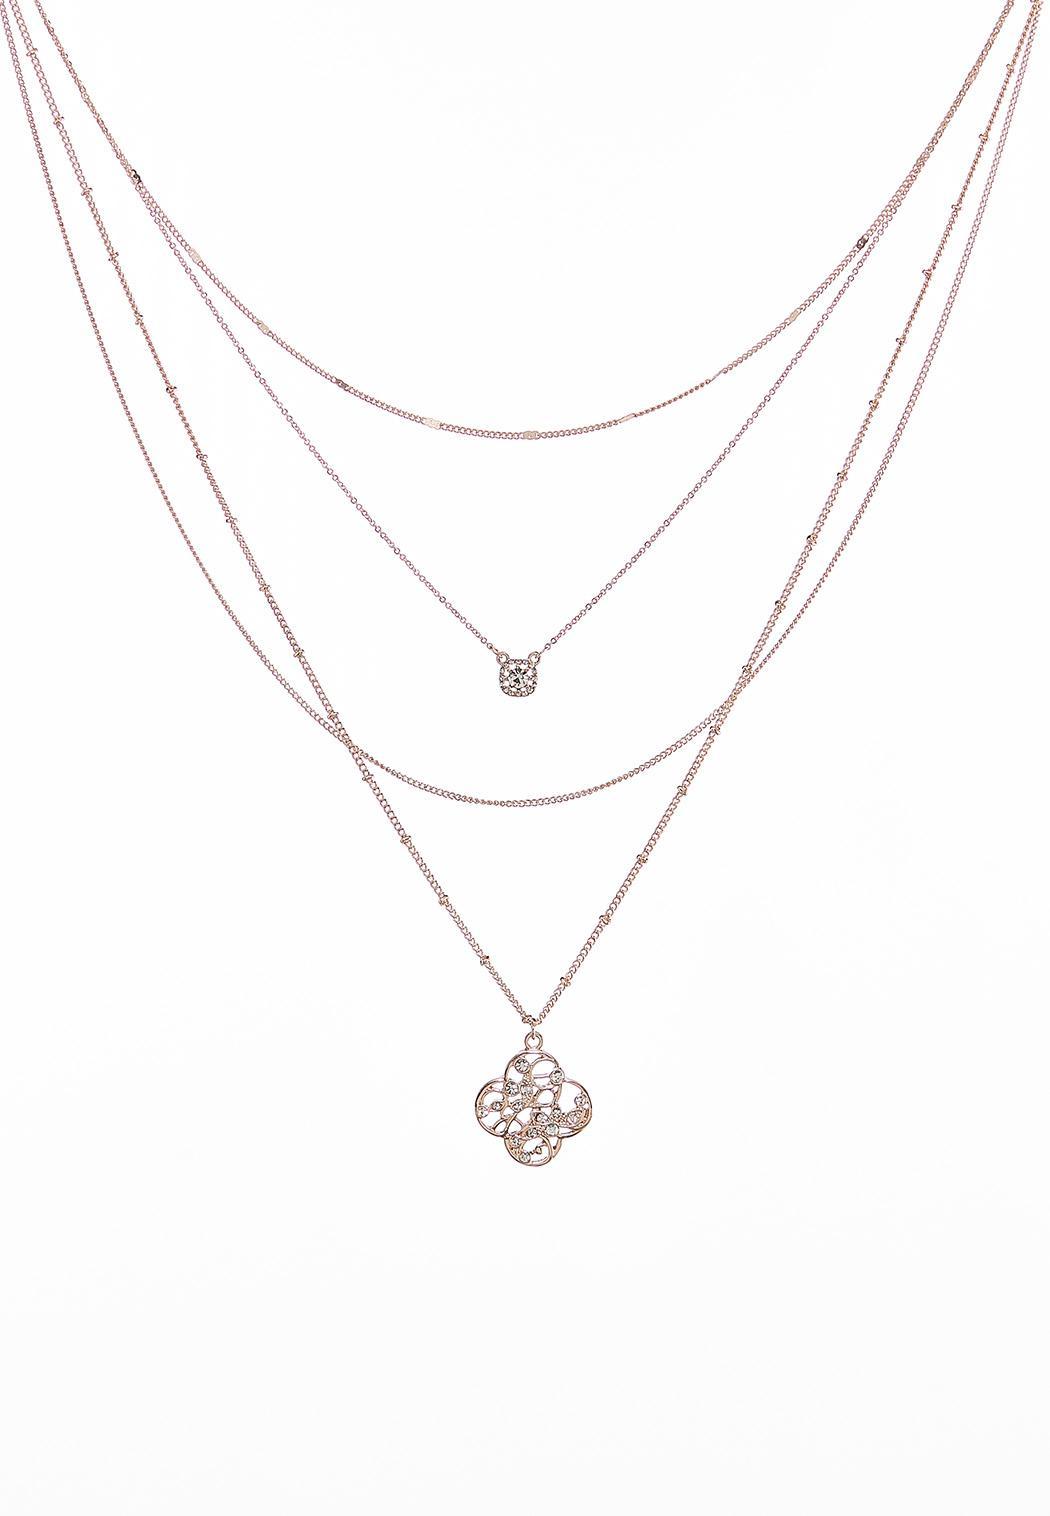 Filigree Layered Necklace